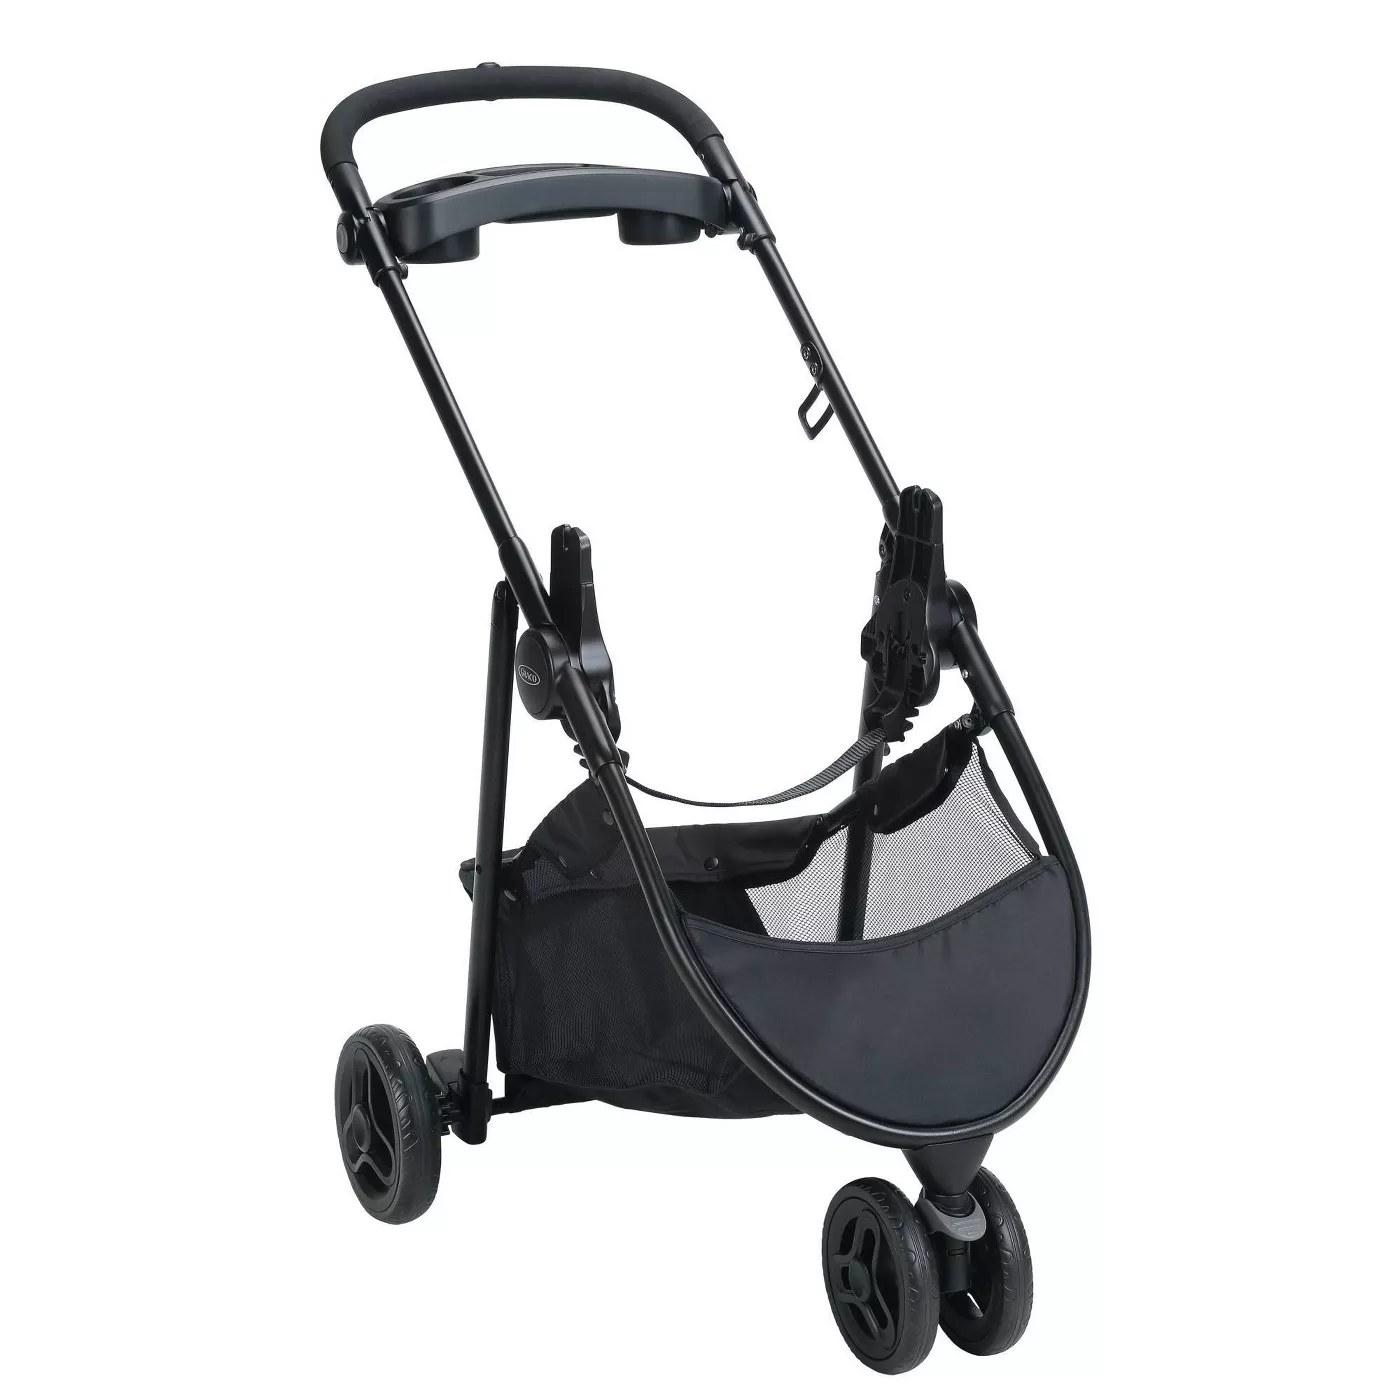 The three-wheel car seat carrier